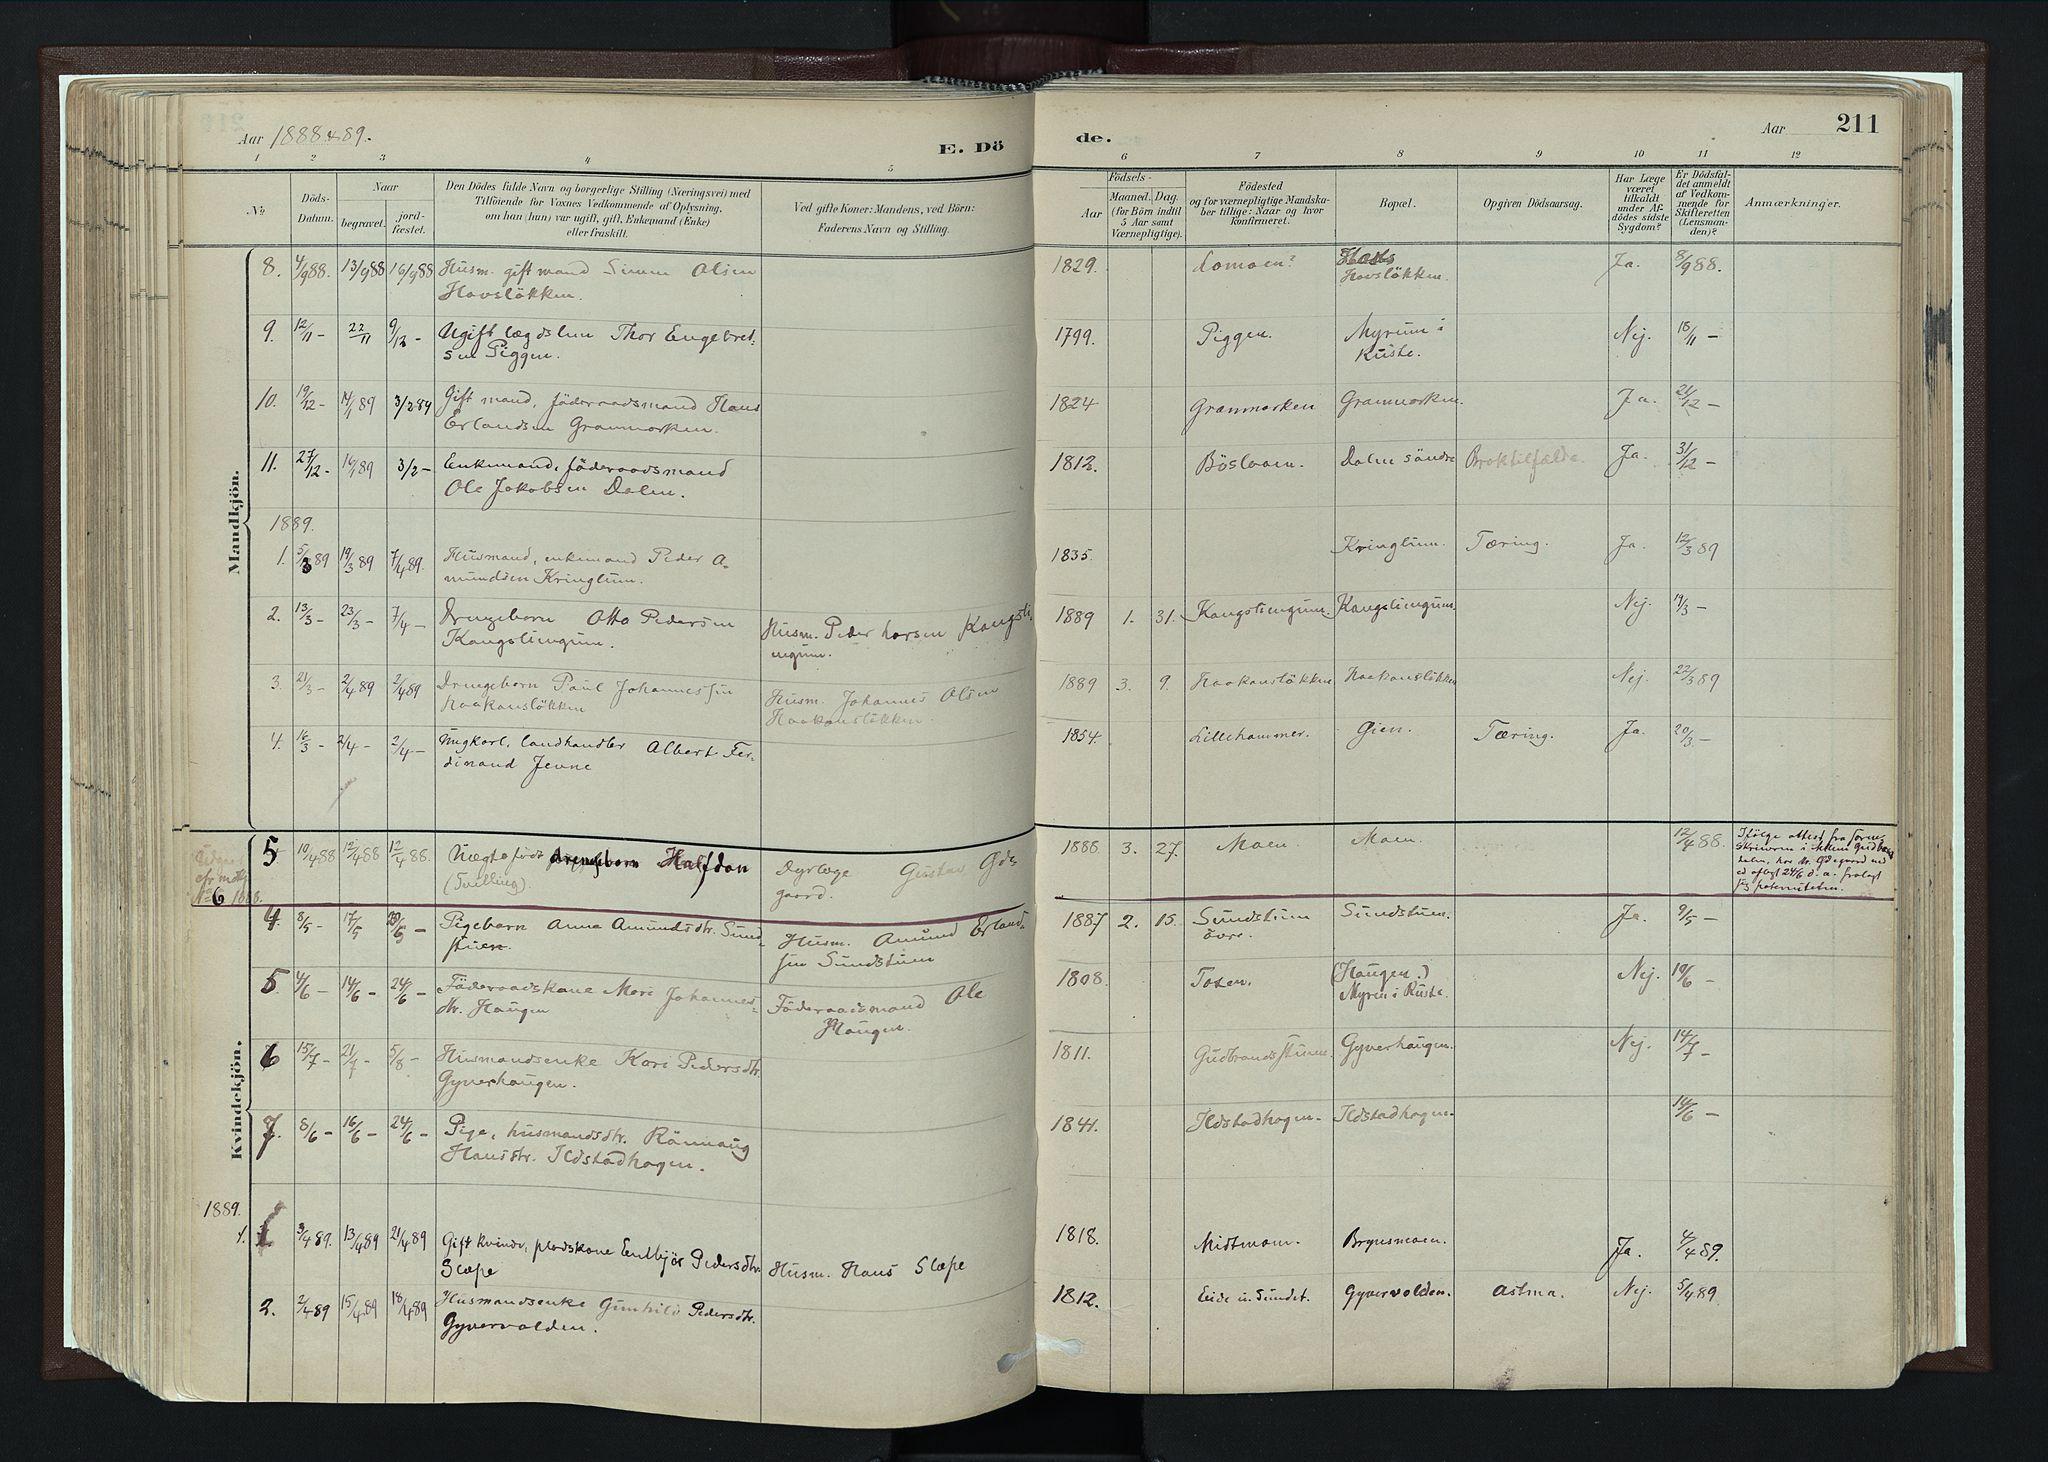 SAH, Nord-Fron prestekontor, Ministerialbok nr. 4, 1884-1914, s. 211